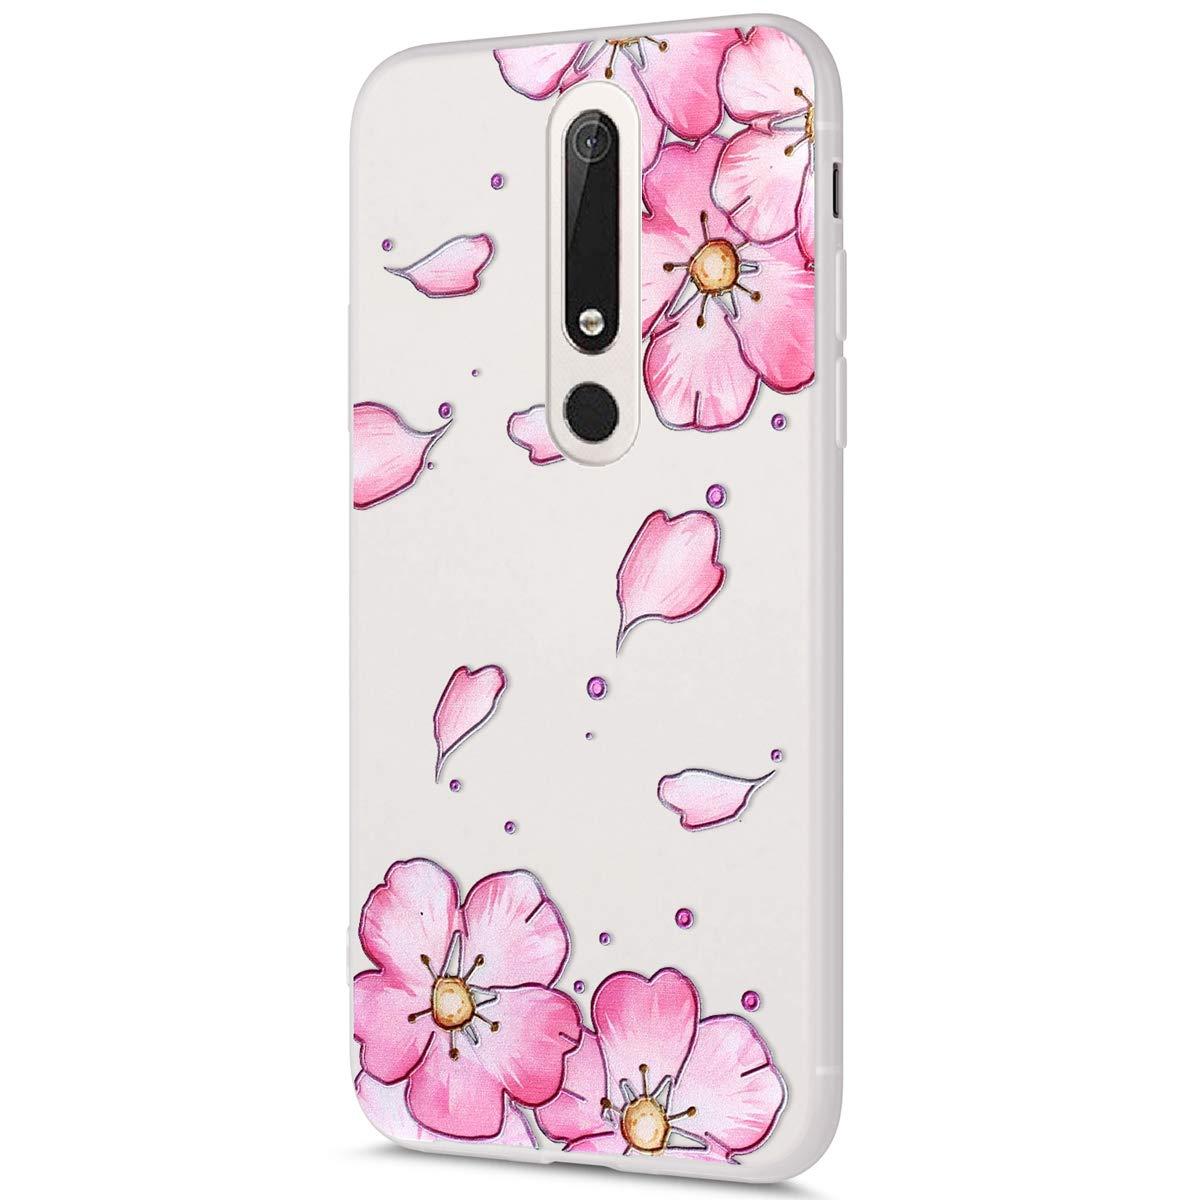 MoreChioce kompatibel mit Nokia 6.1 2018 H/ülle,kompatibel Nokia 6.1 2018 Transparent H/ülle,Kreativ Muster M/ädchen Sto/ßfest Handyh/ülle Kristall TPU Flexible Gel Bumper